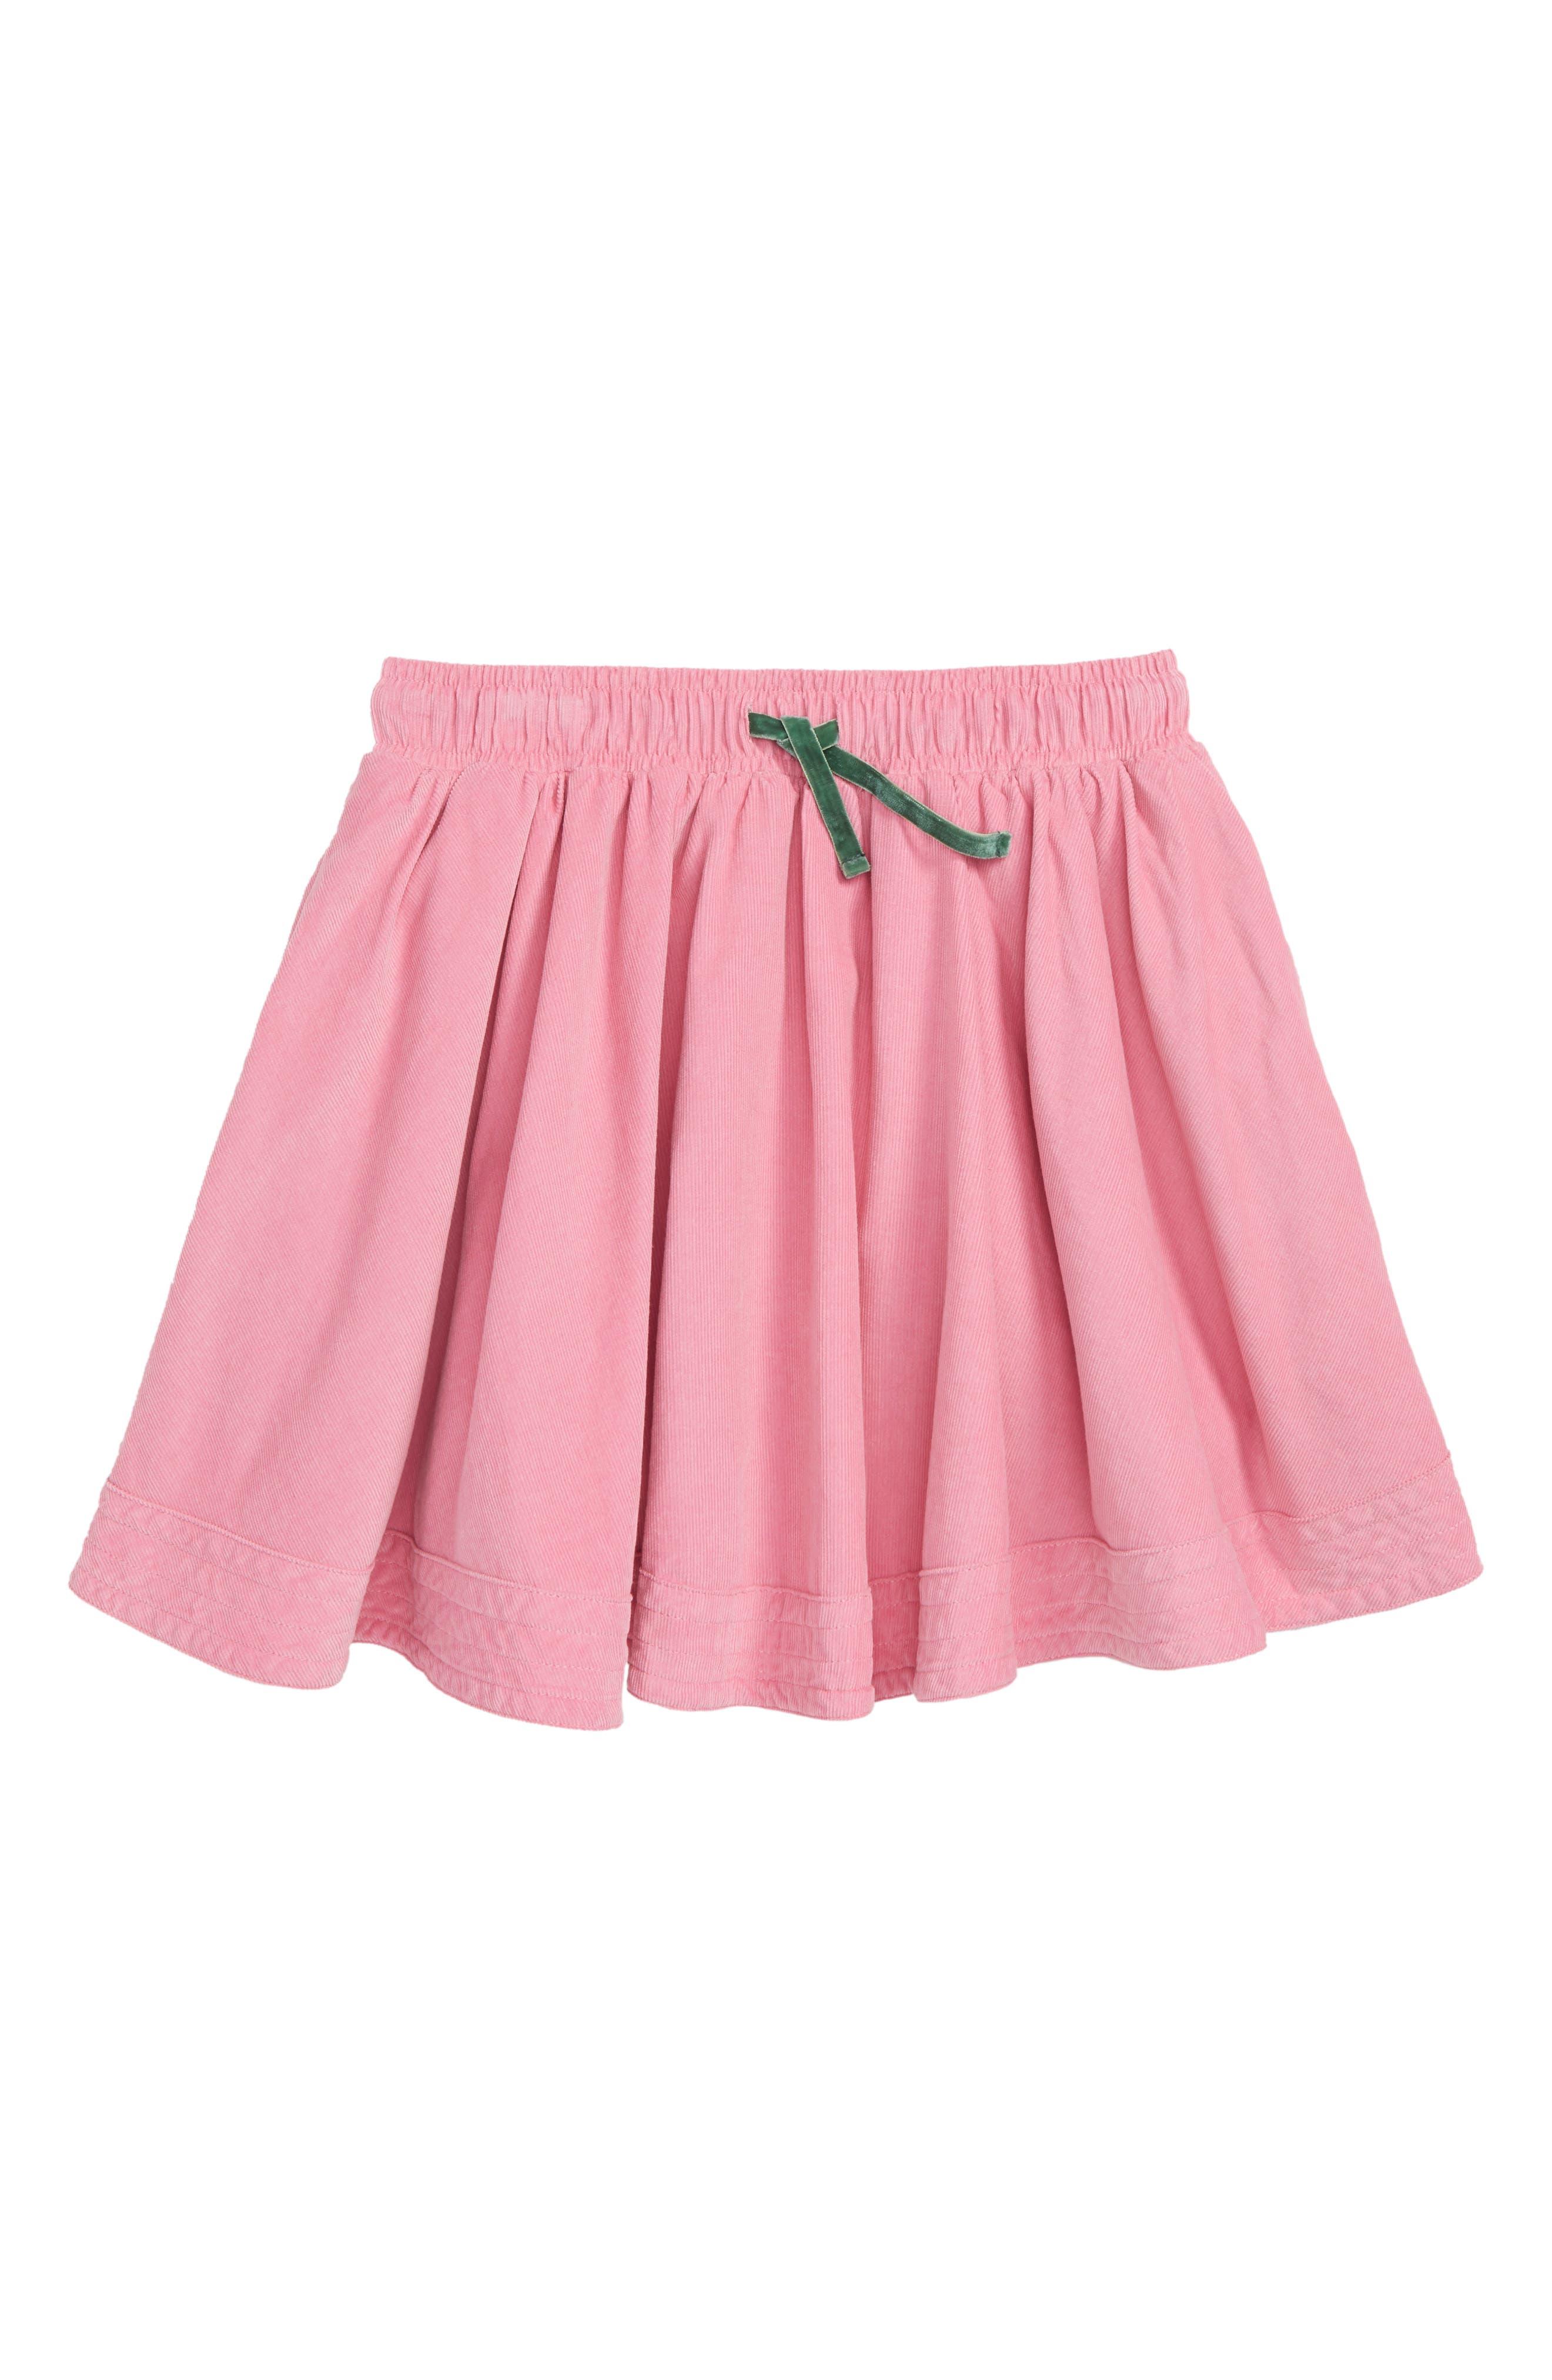 Simple Colorful Corduroy Skirt,                             Main thumbnail 1, color,                             664